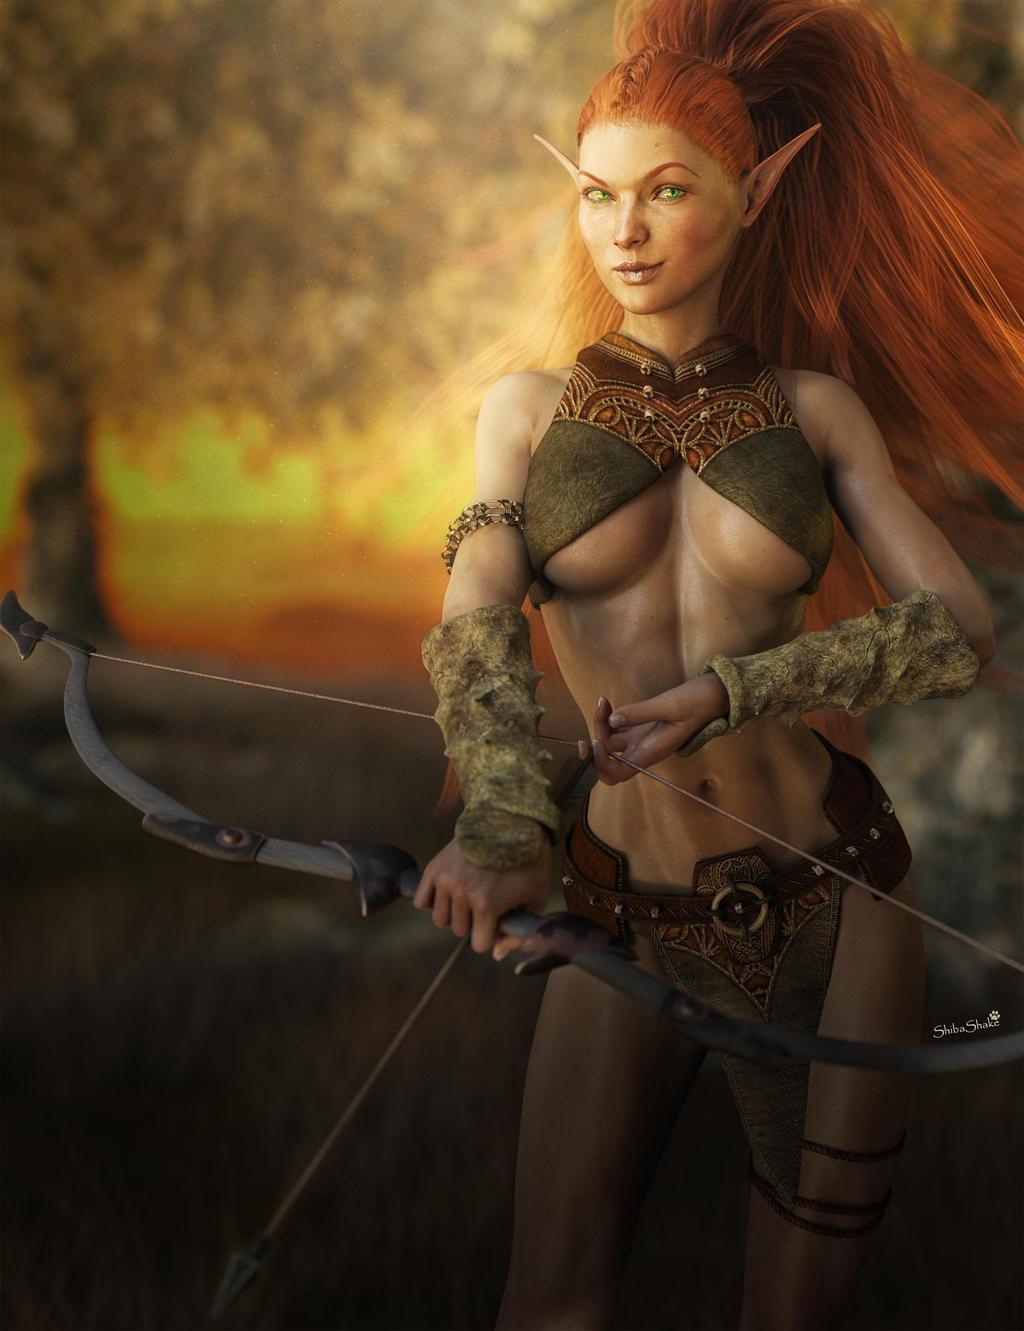 Fantasy art redhead has been